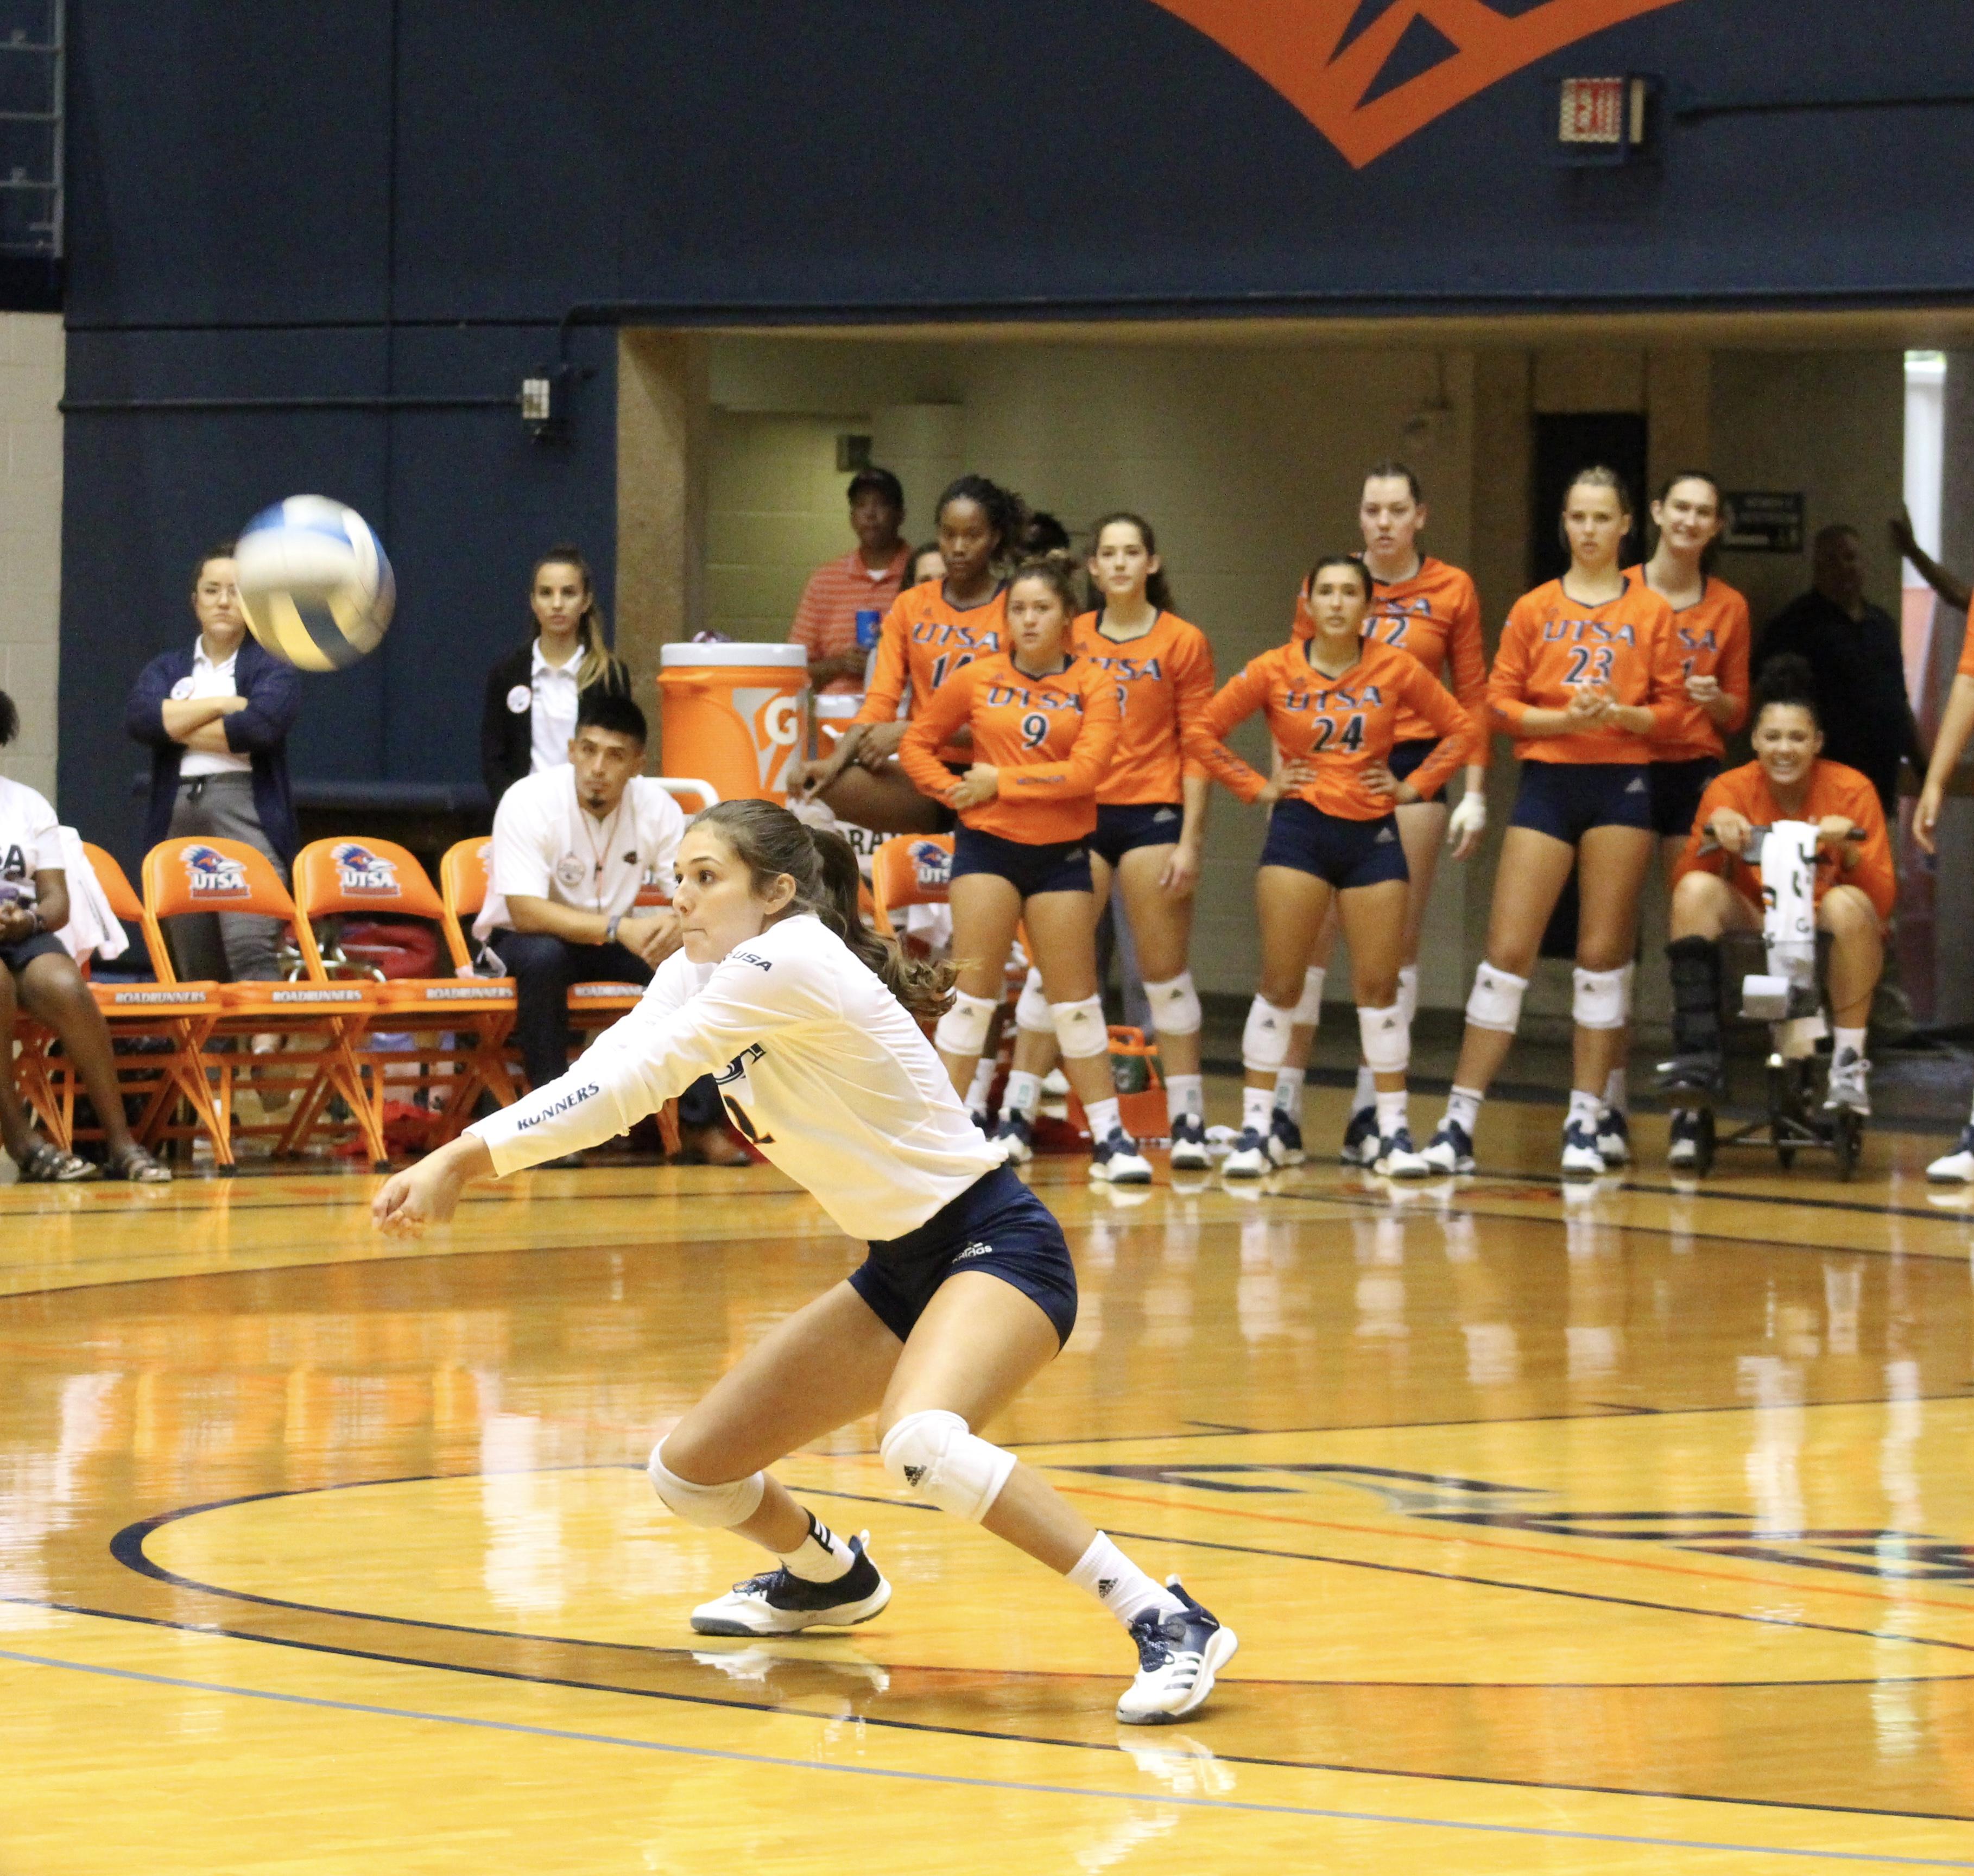 Emily Ramirez passing the ball to the setter. Photo by Julia Maeinus